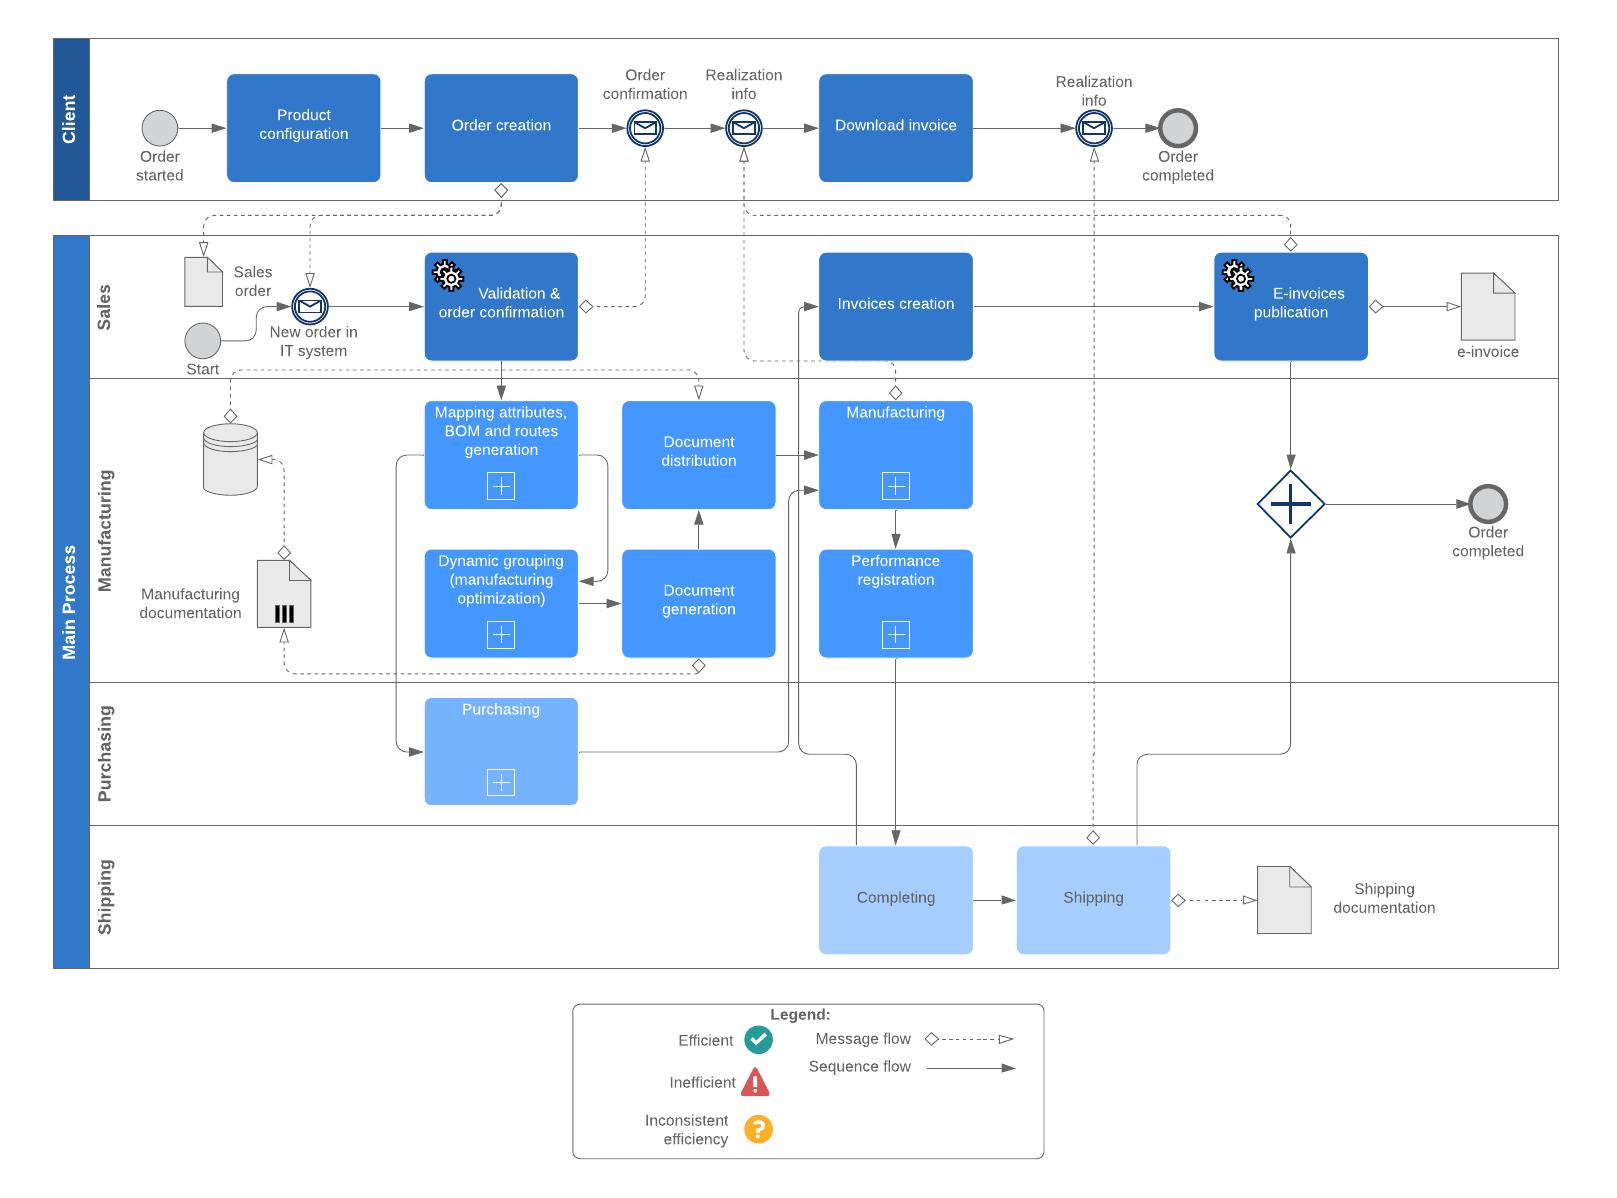 BPMN collaborative manufacturing process example